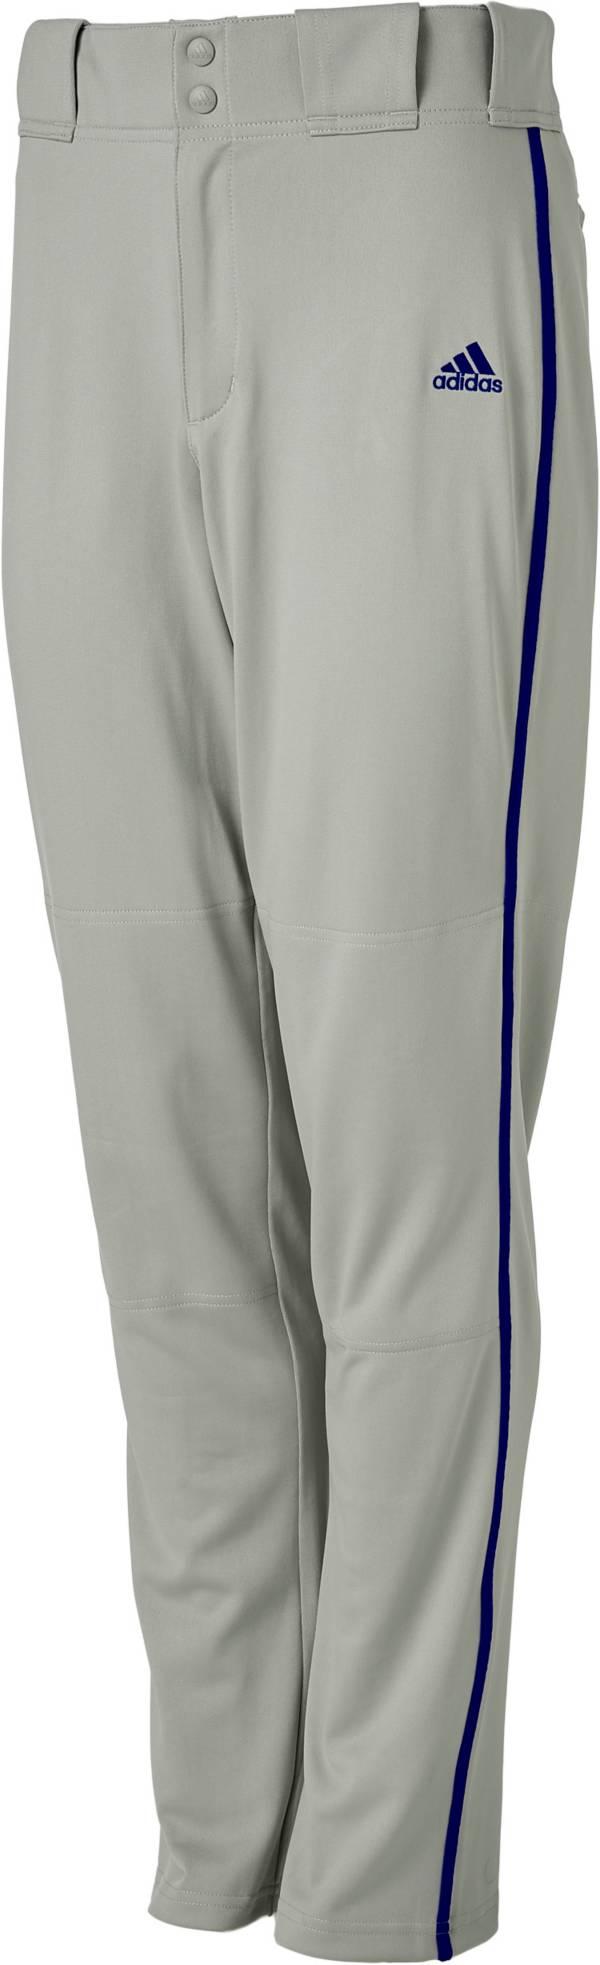 adidas Men's Phenom Open Bottom Piped Baseball Pants product image